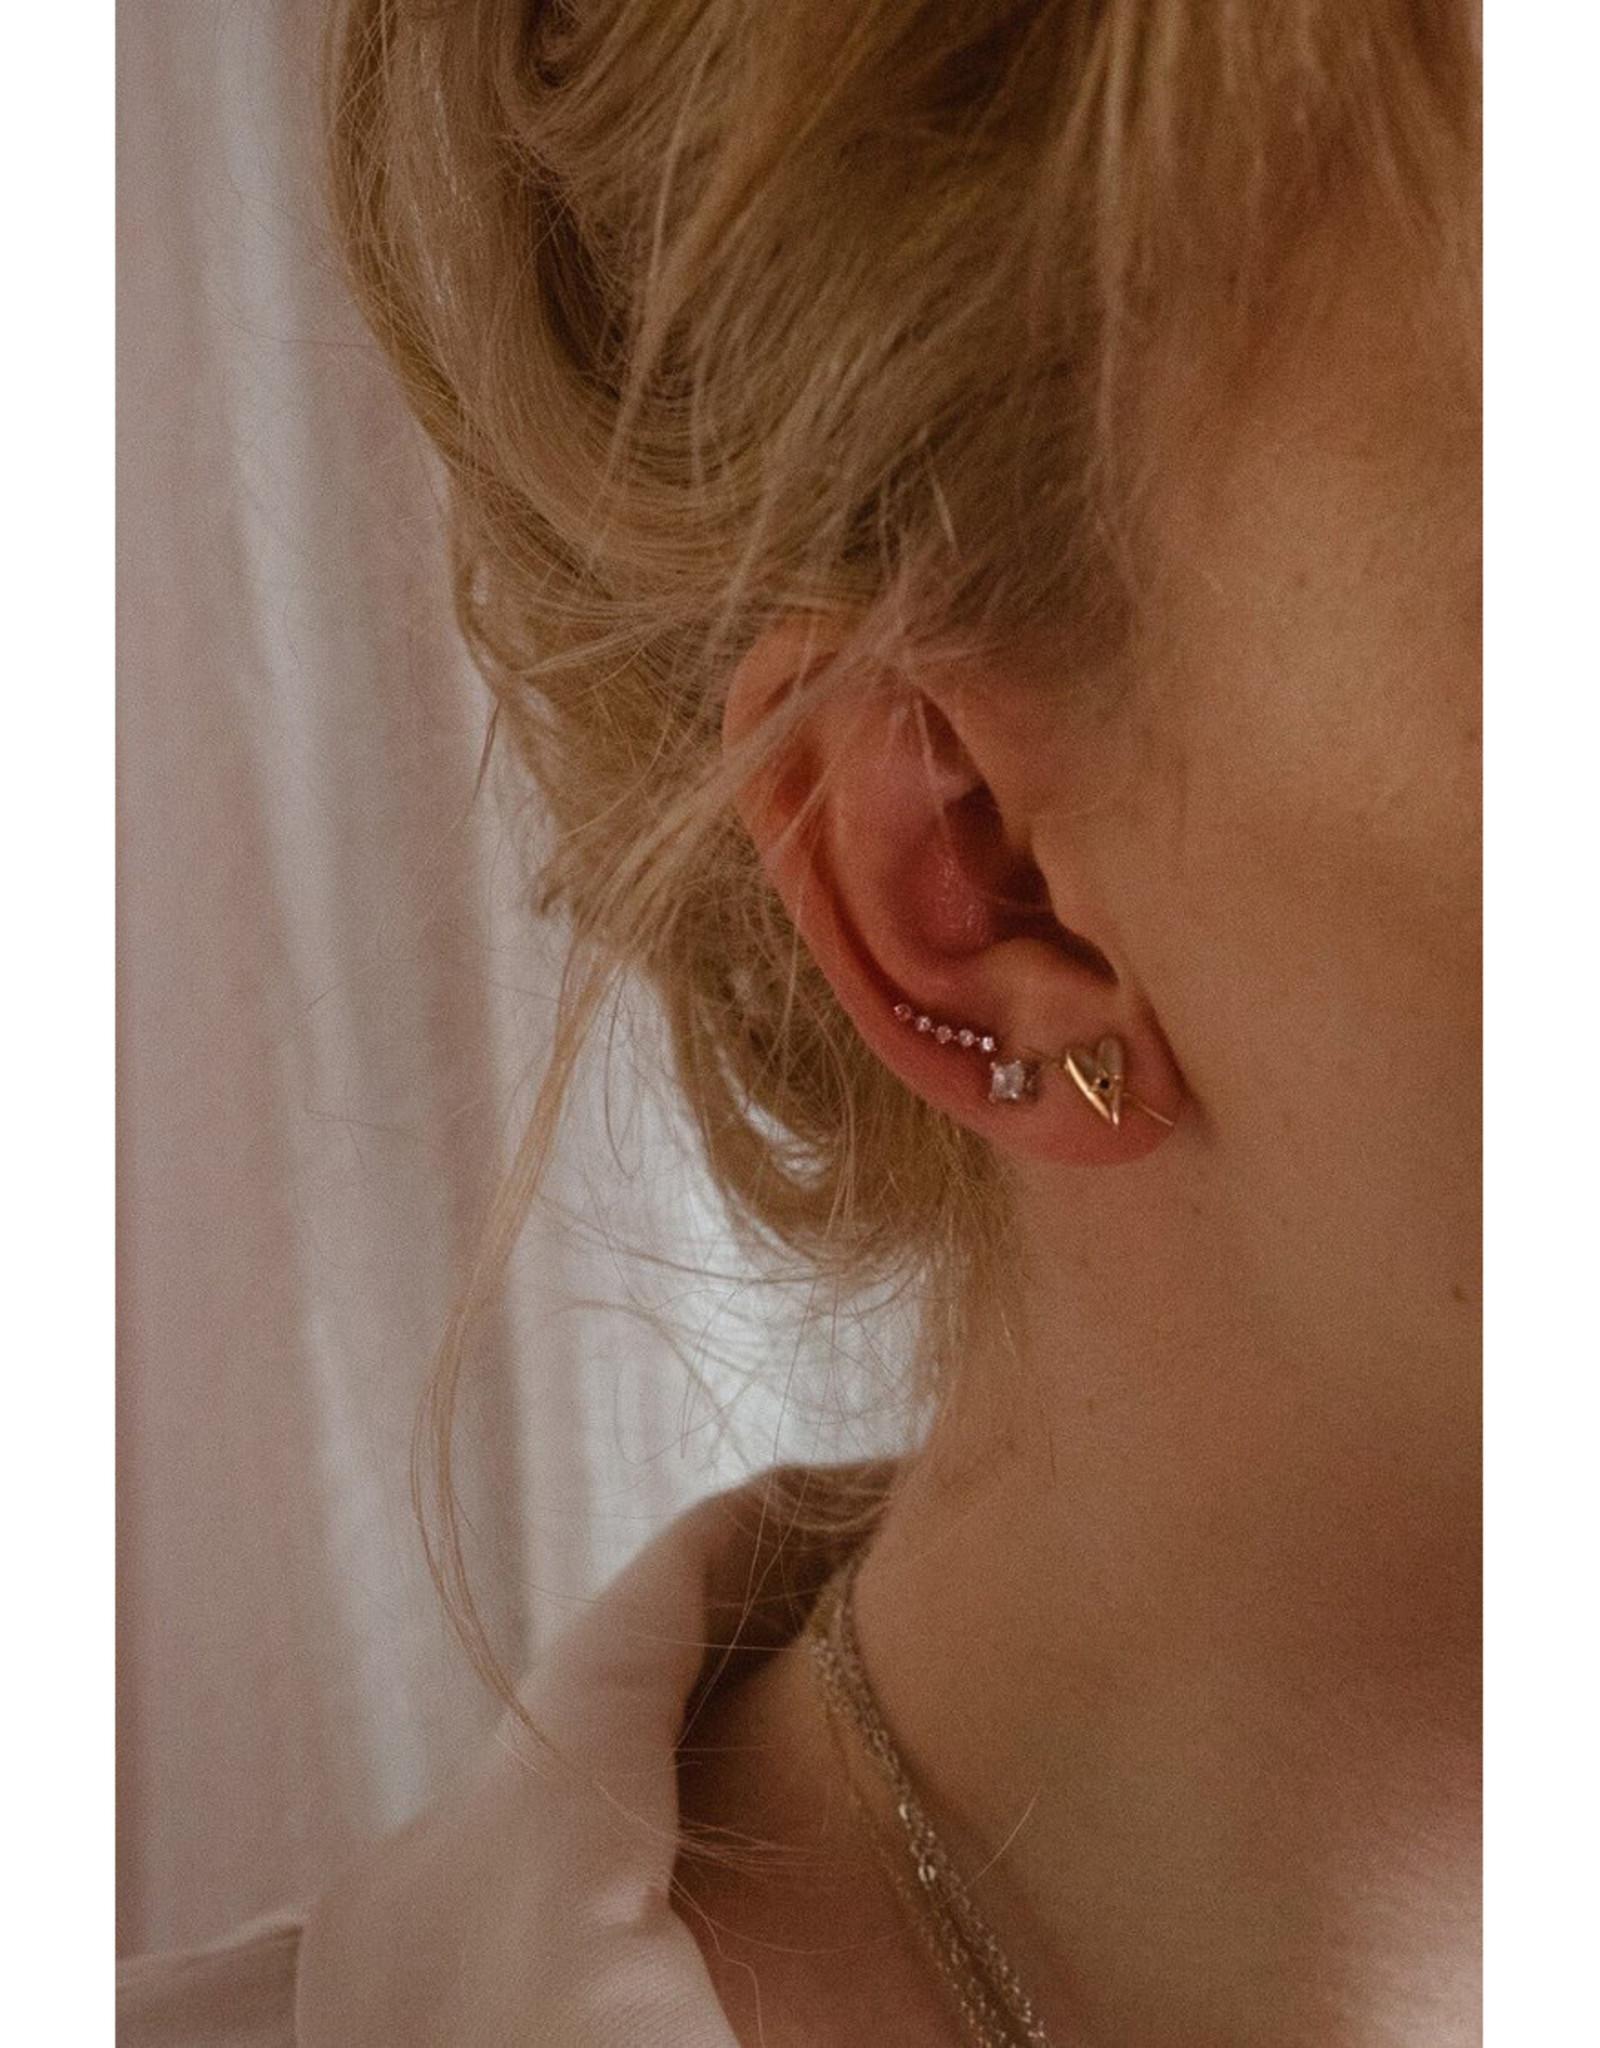 Sarah Mulder Jewelry Silver Lady Ear Climbers - Rose Quartz